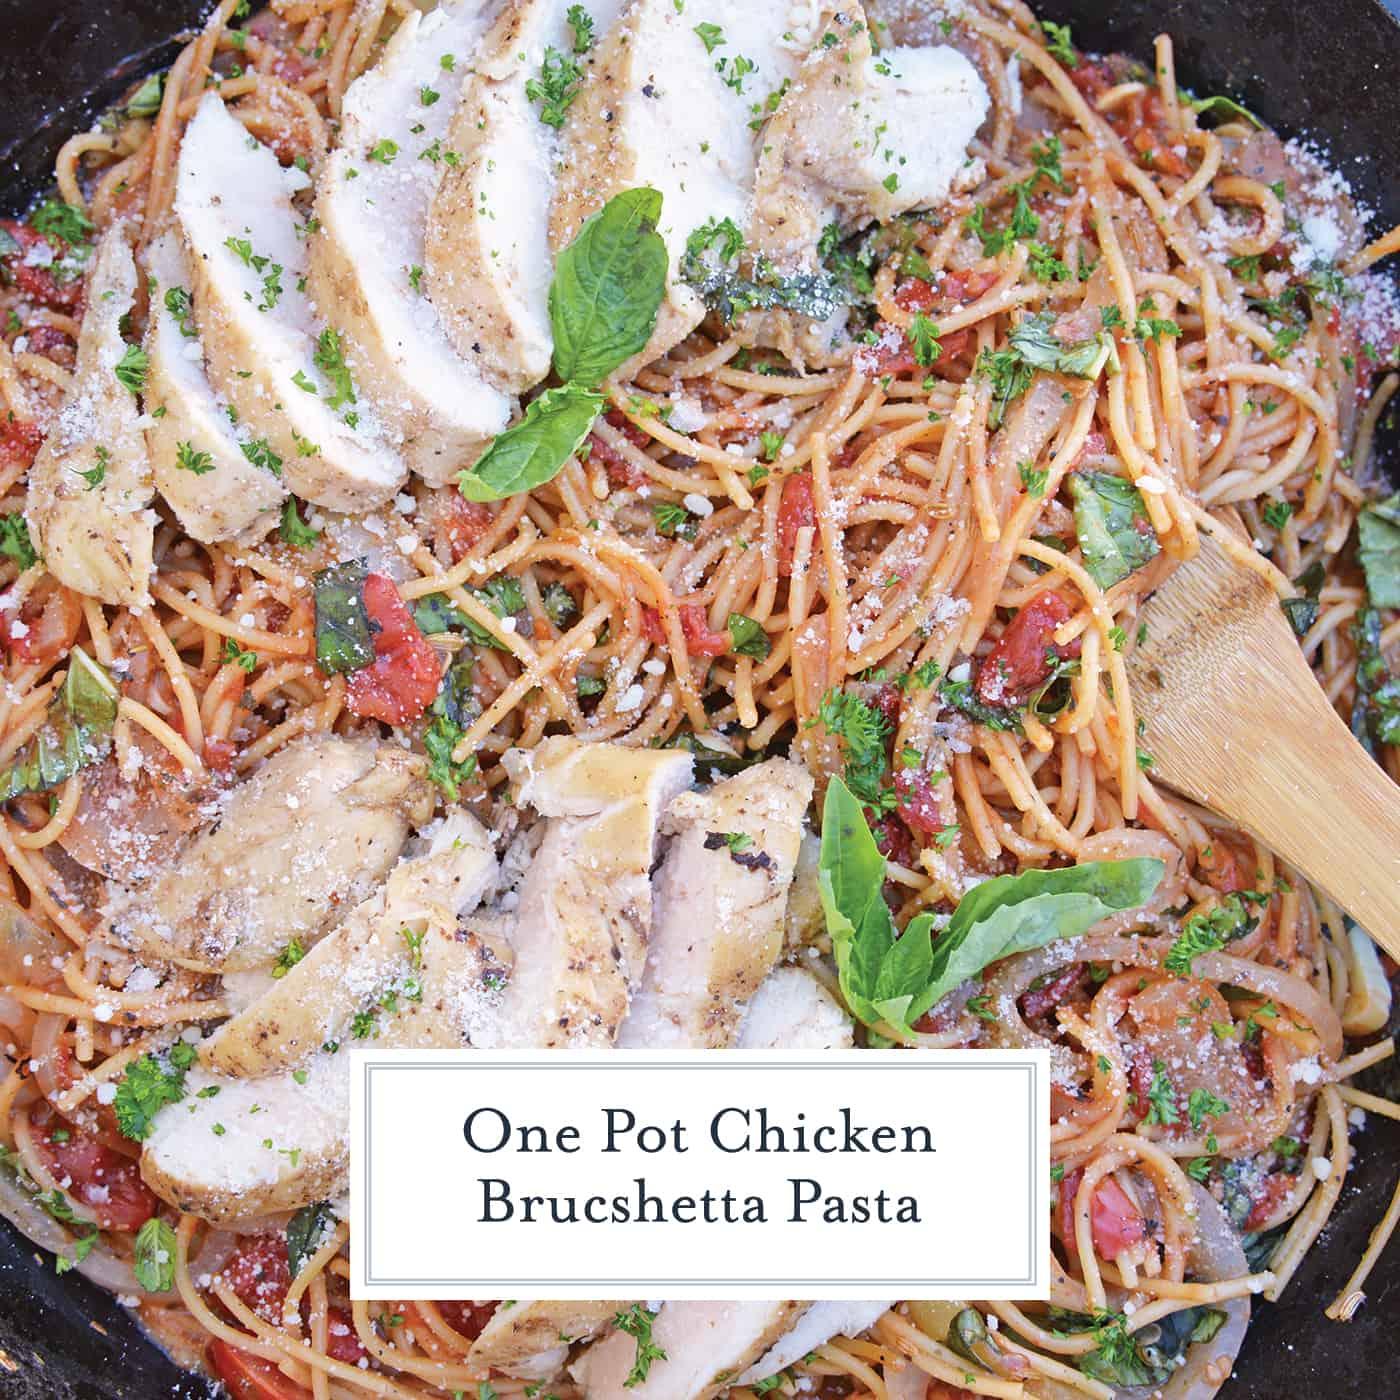 Overhead of One Pot Chicken Bruschetta Pasta